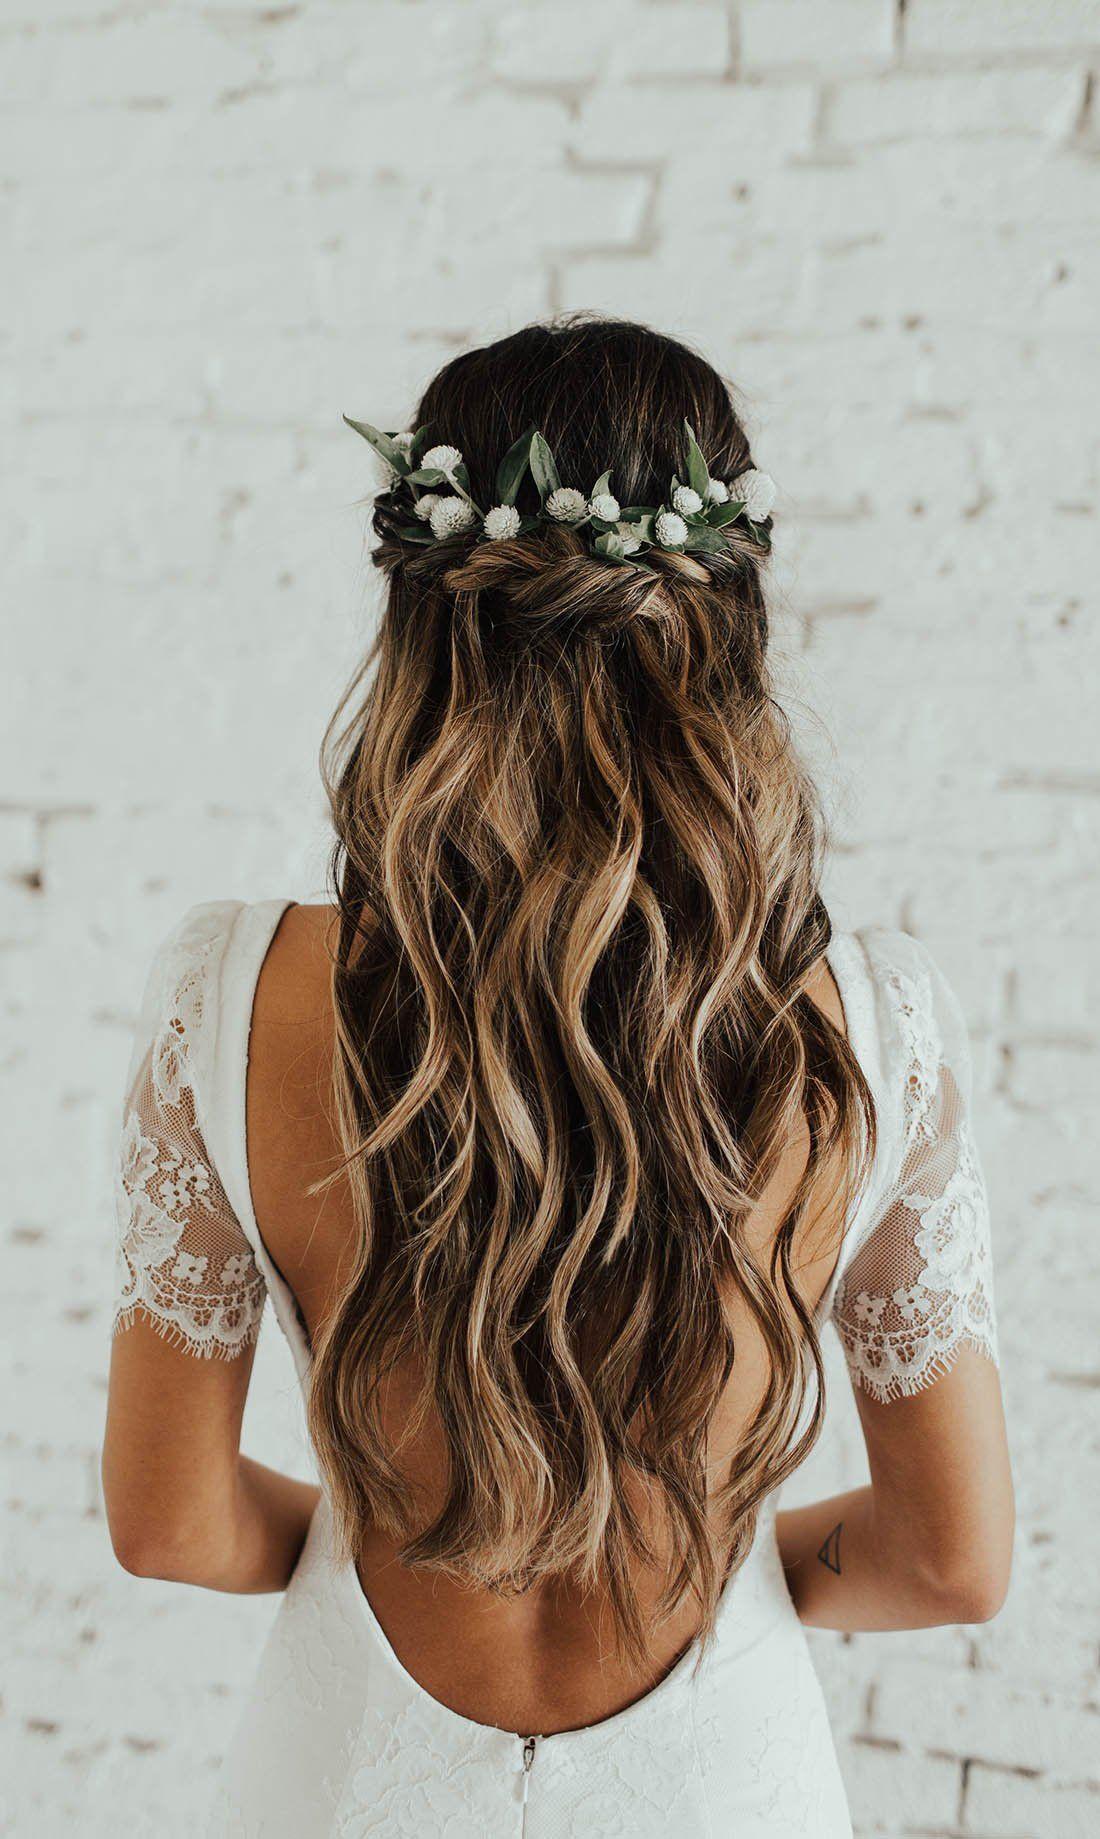 34 boho wedding hairstyles to inspire | wedding | wedding